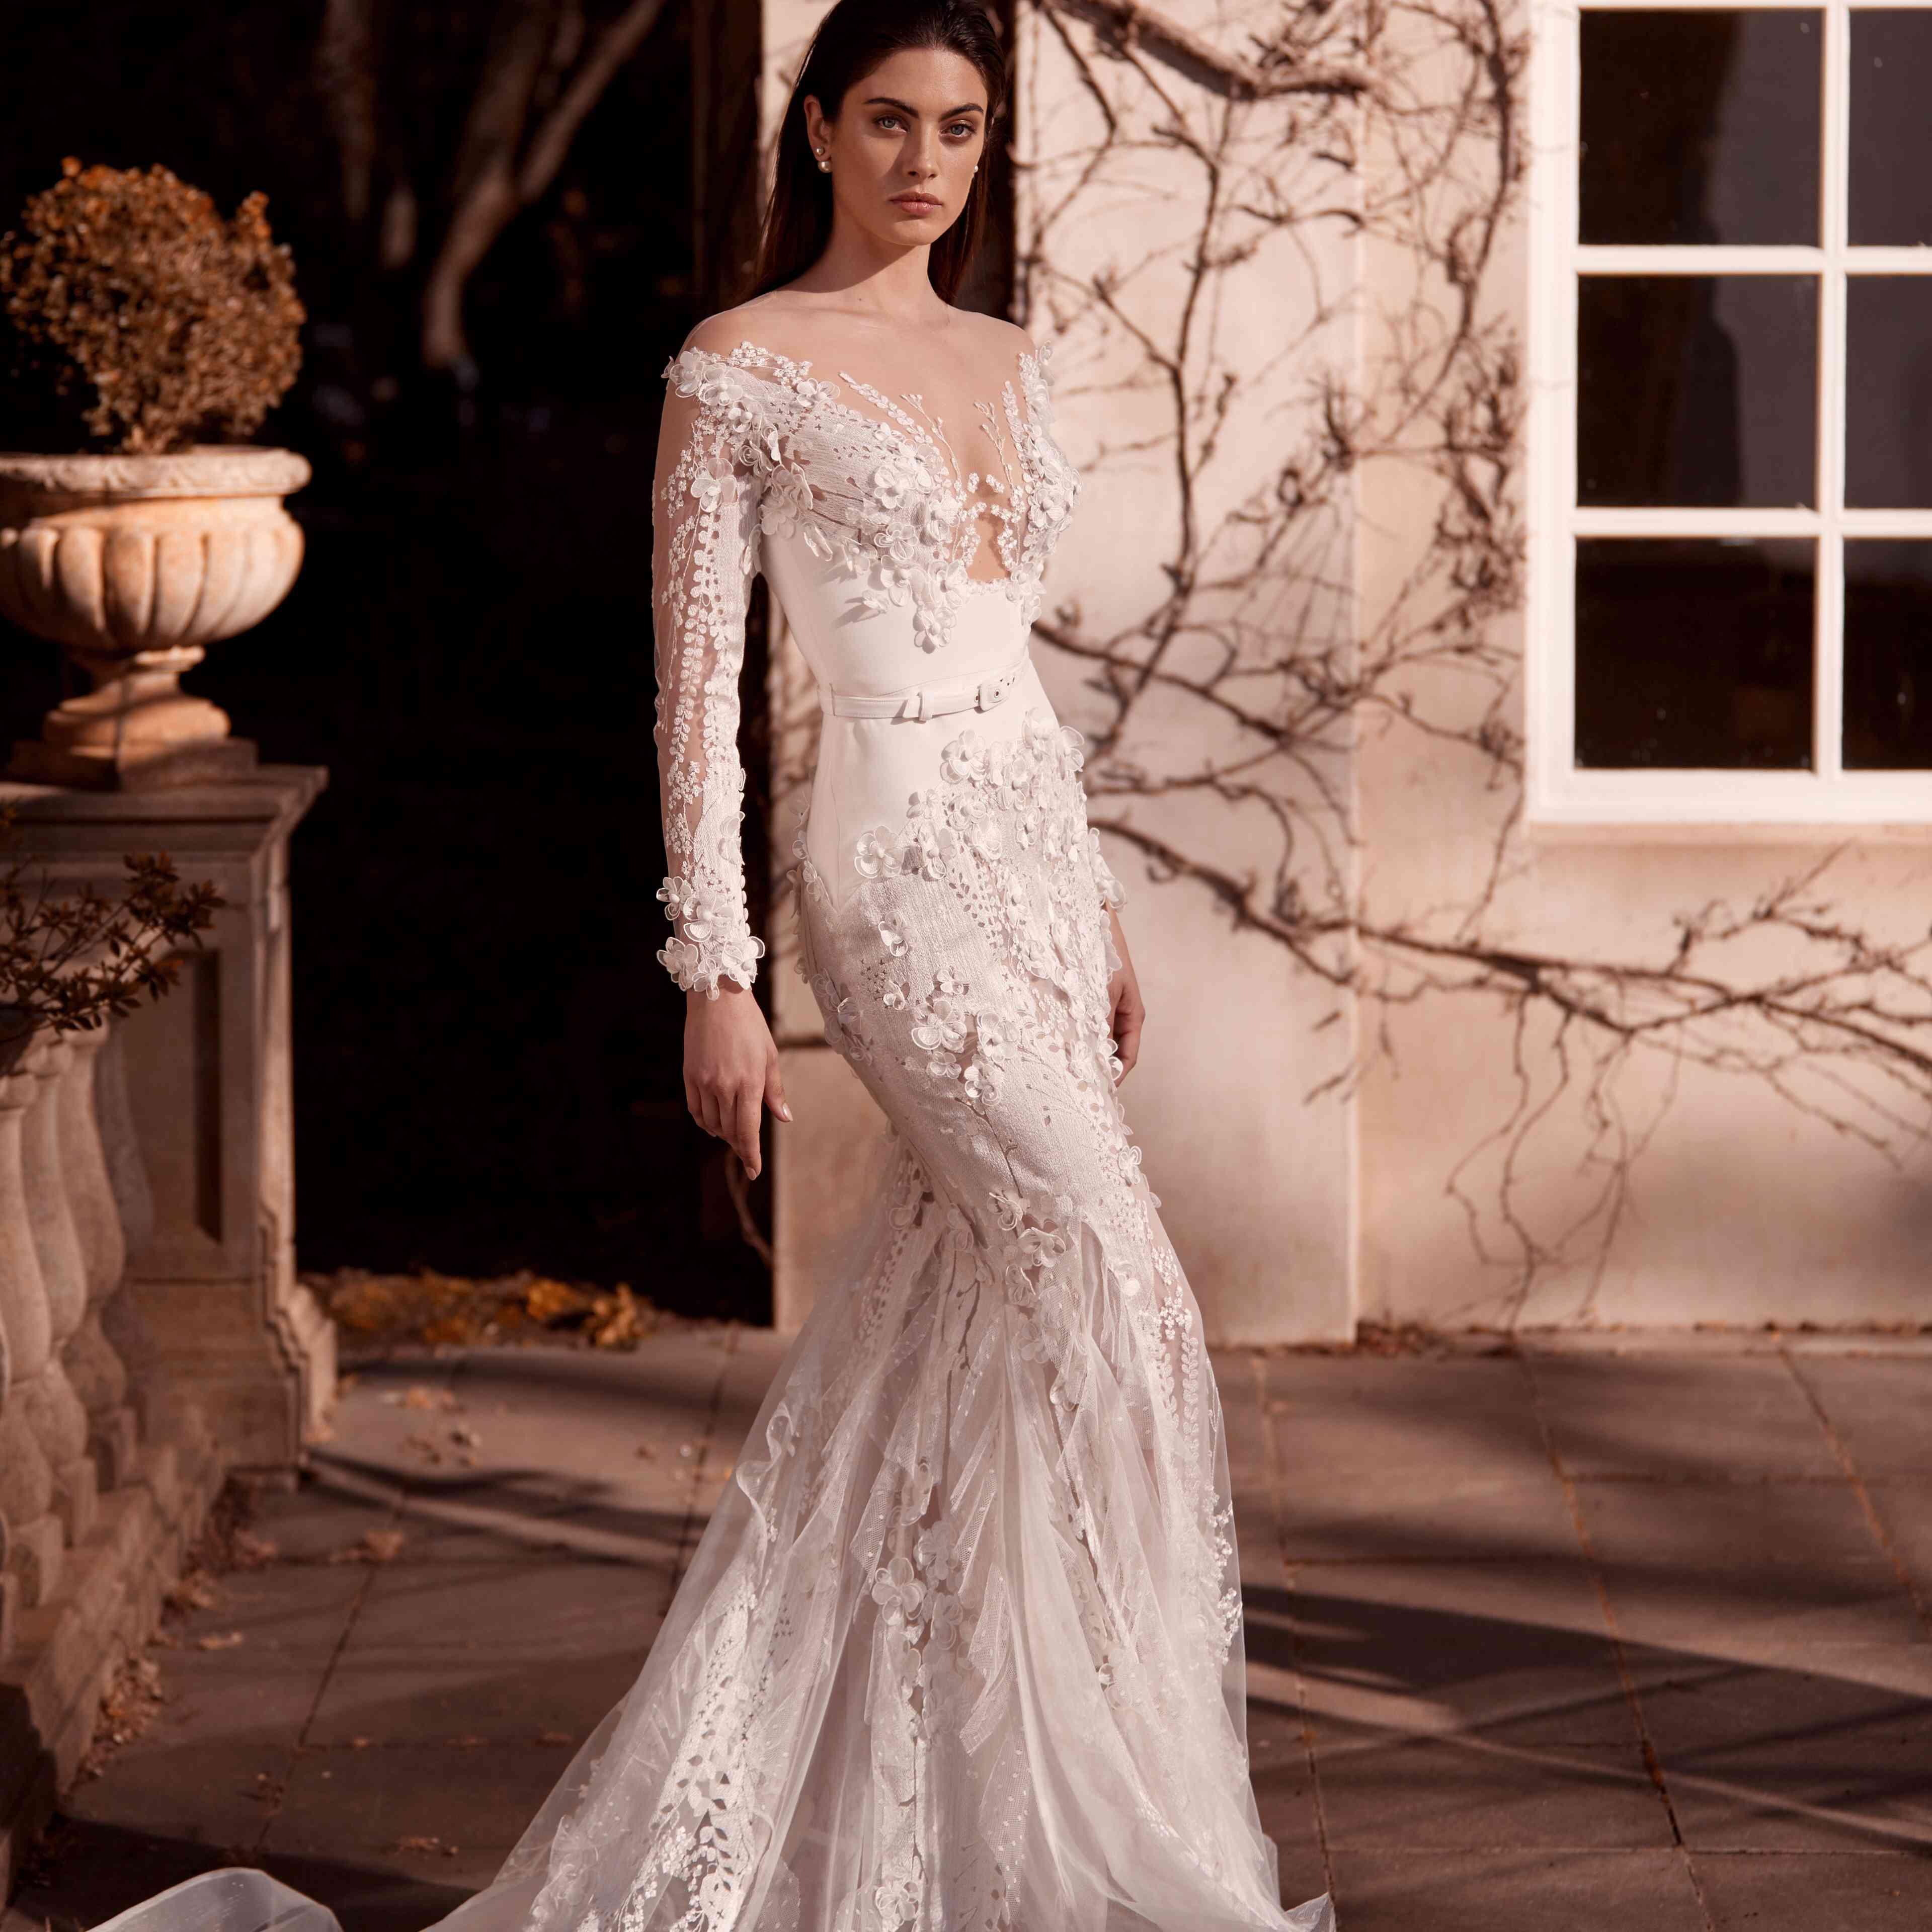 Manon long sleeve wedding dress